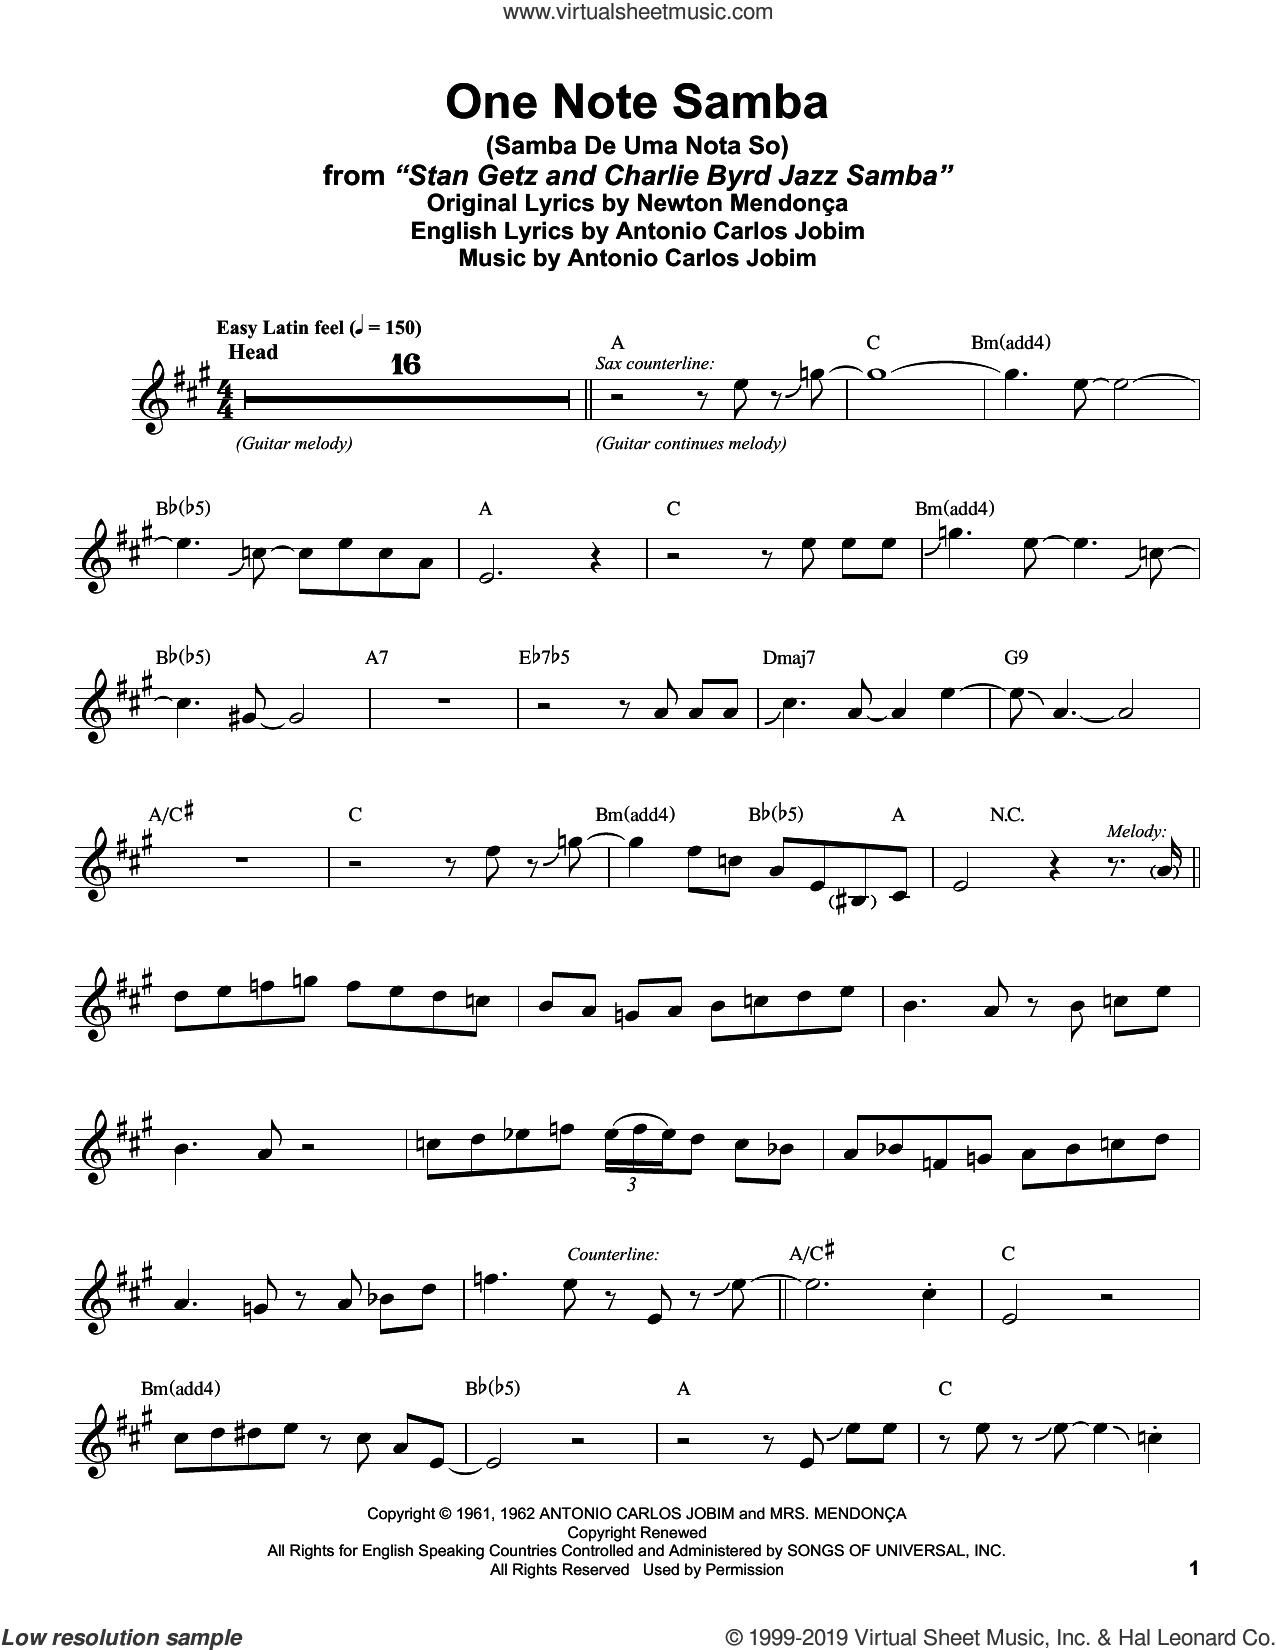 One Note Samba (Samba De Uma Nota So) sheet music for alto saxophone (transcription) by Stan Getz, Antonio Carlos Jobim and Newton Mendonca, intermediate skill level